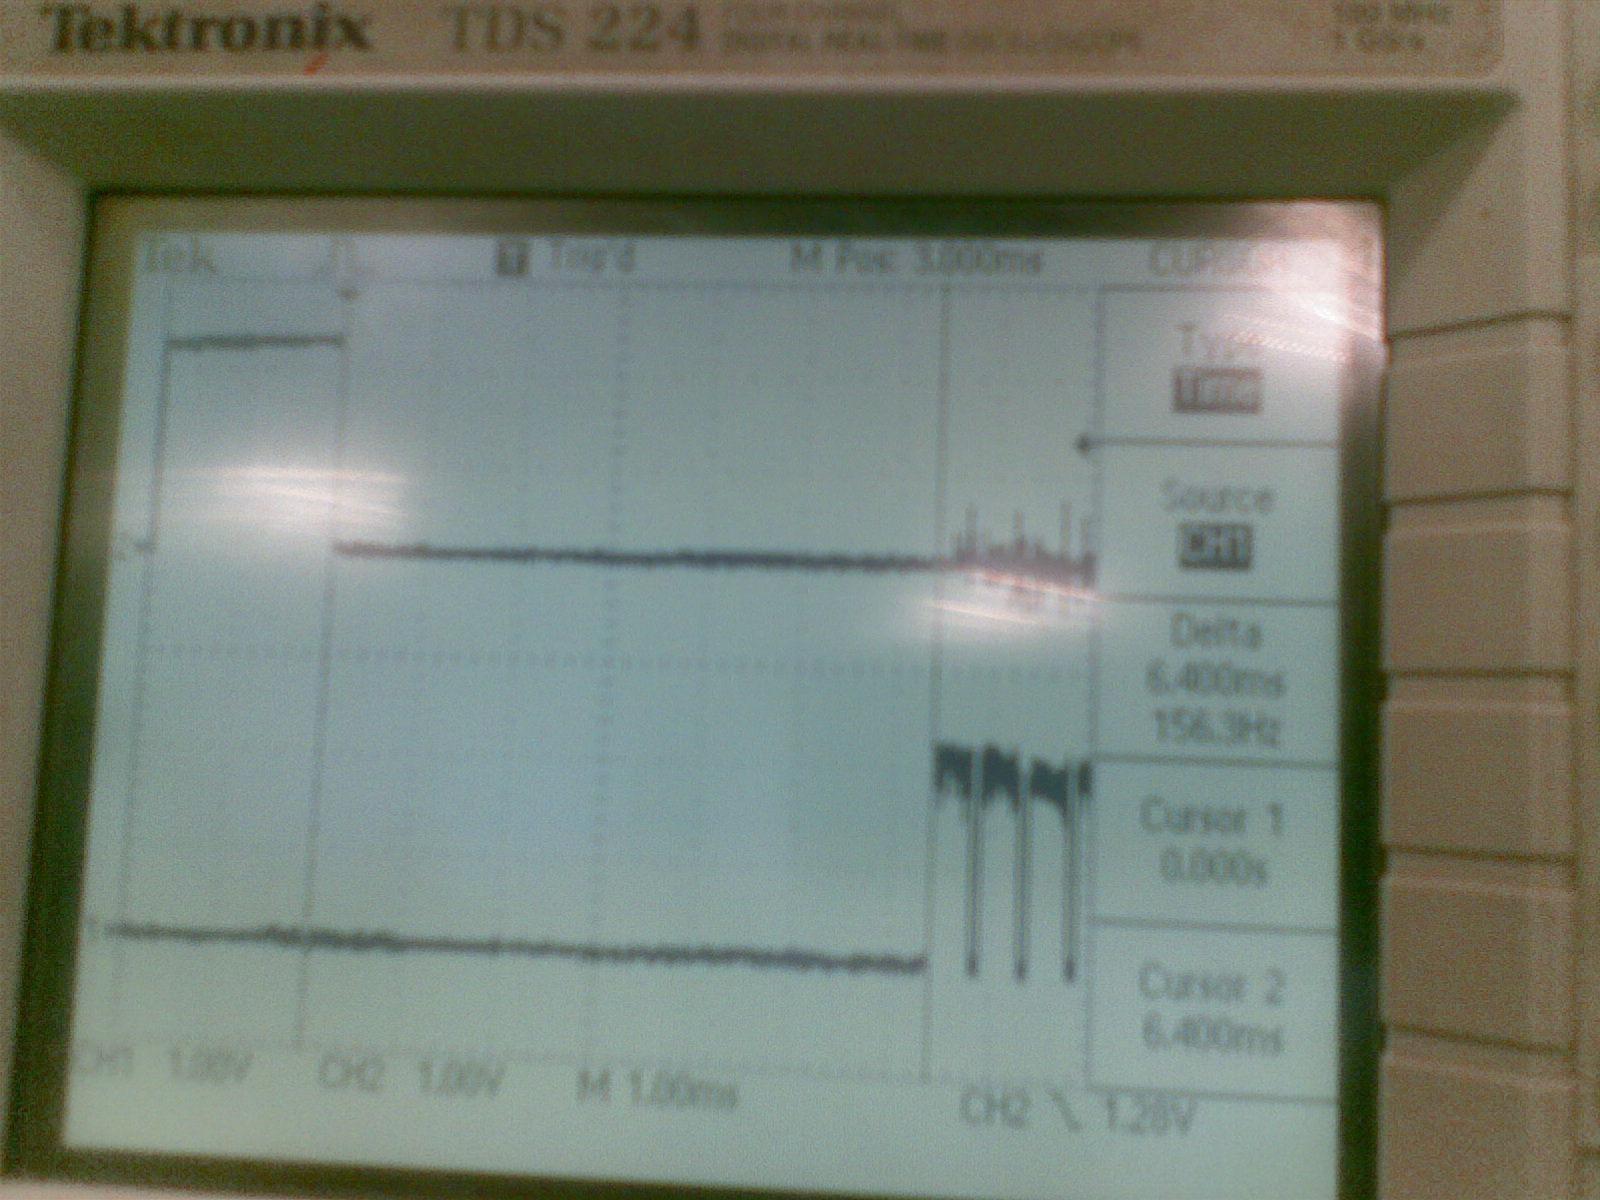 2009-09-26 04:46:47 ov9655 cmos sensor on blackfin EZ527 kit: PPI